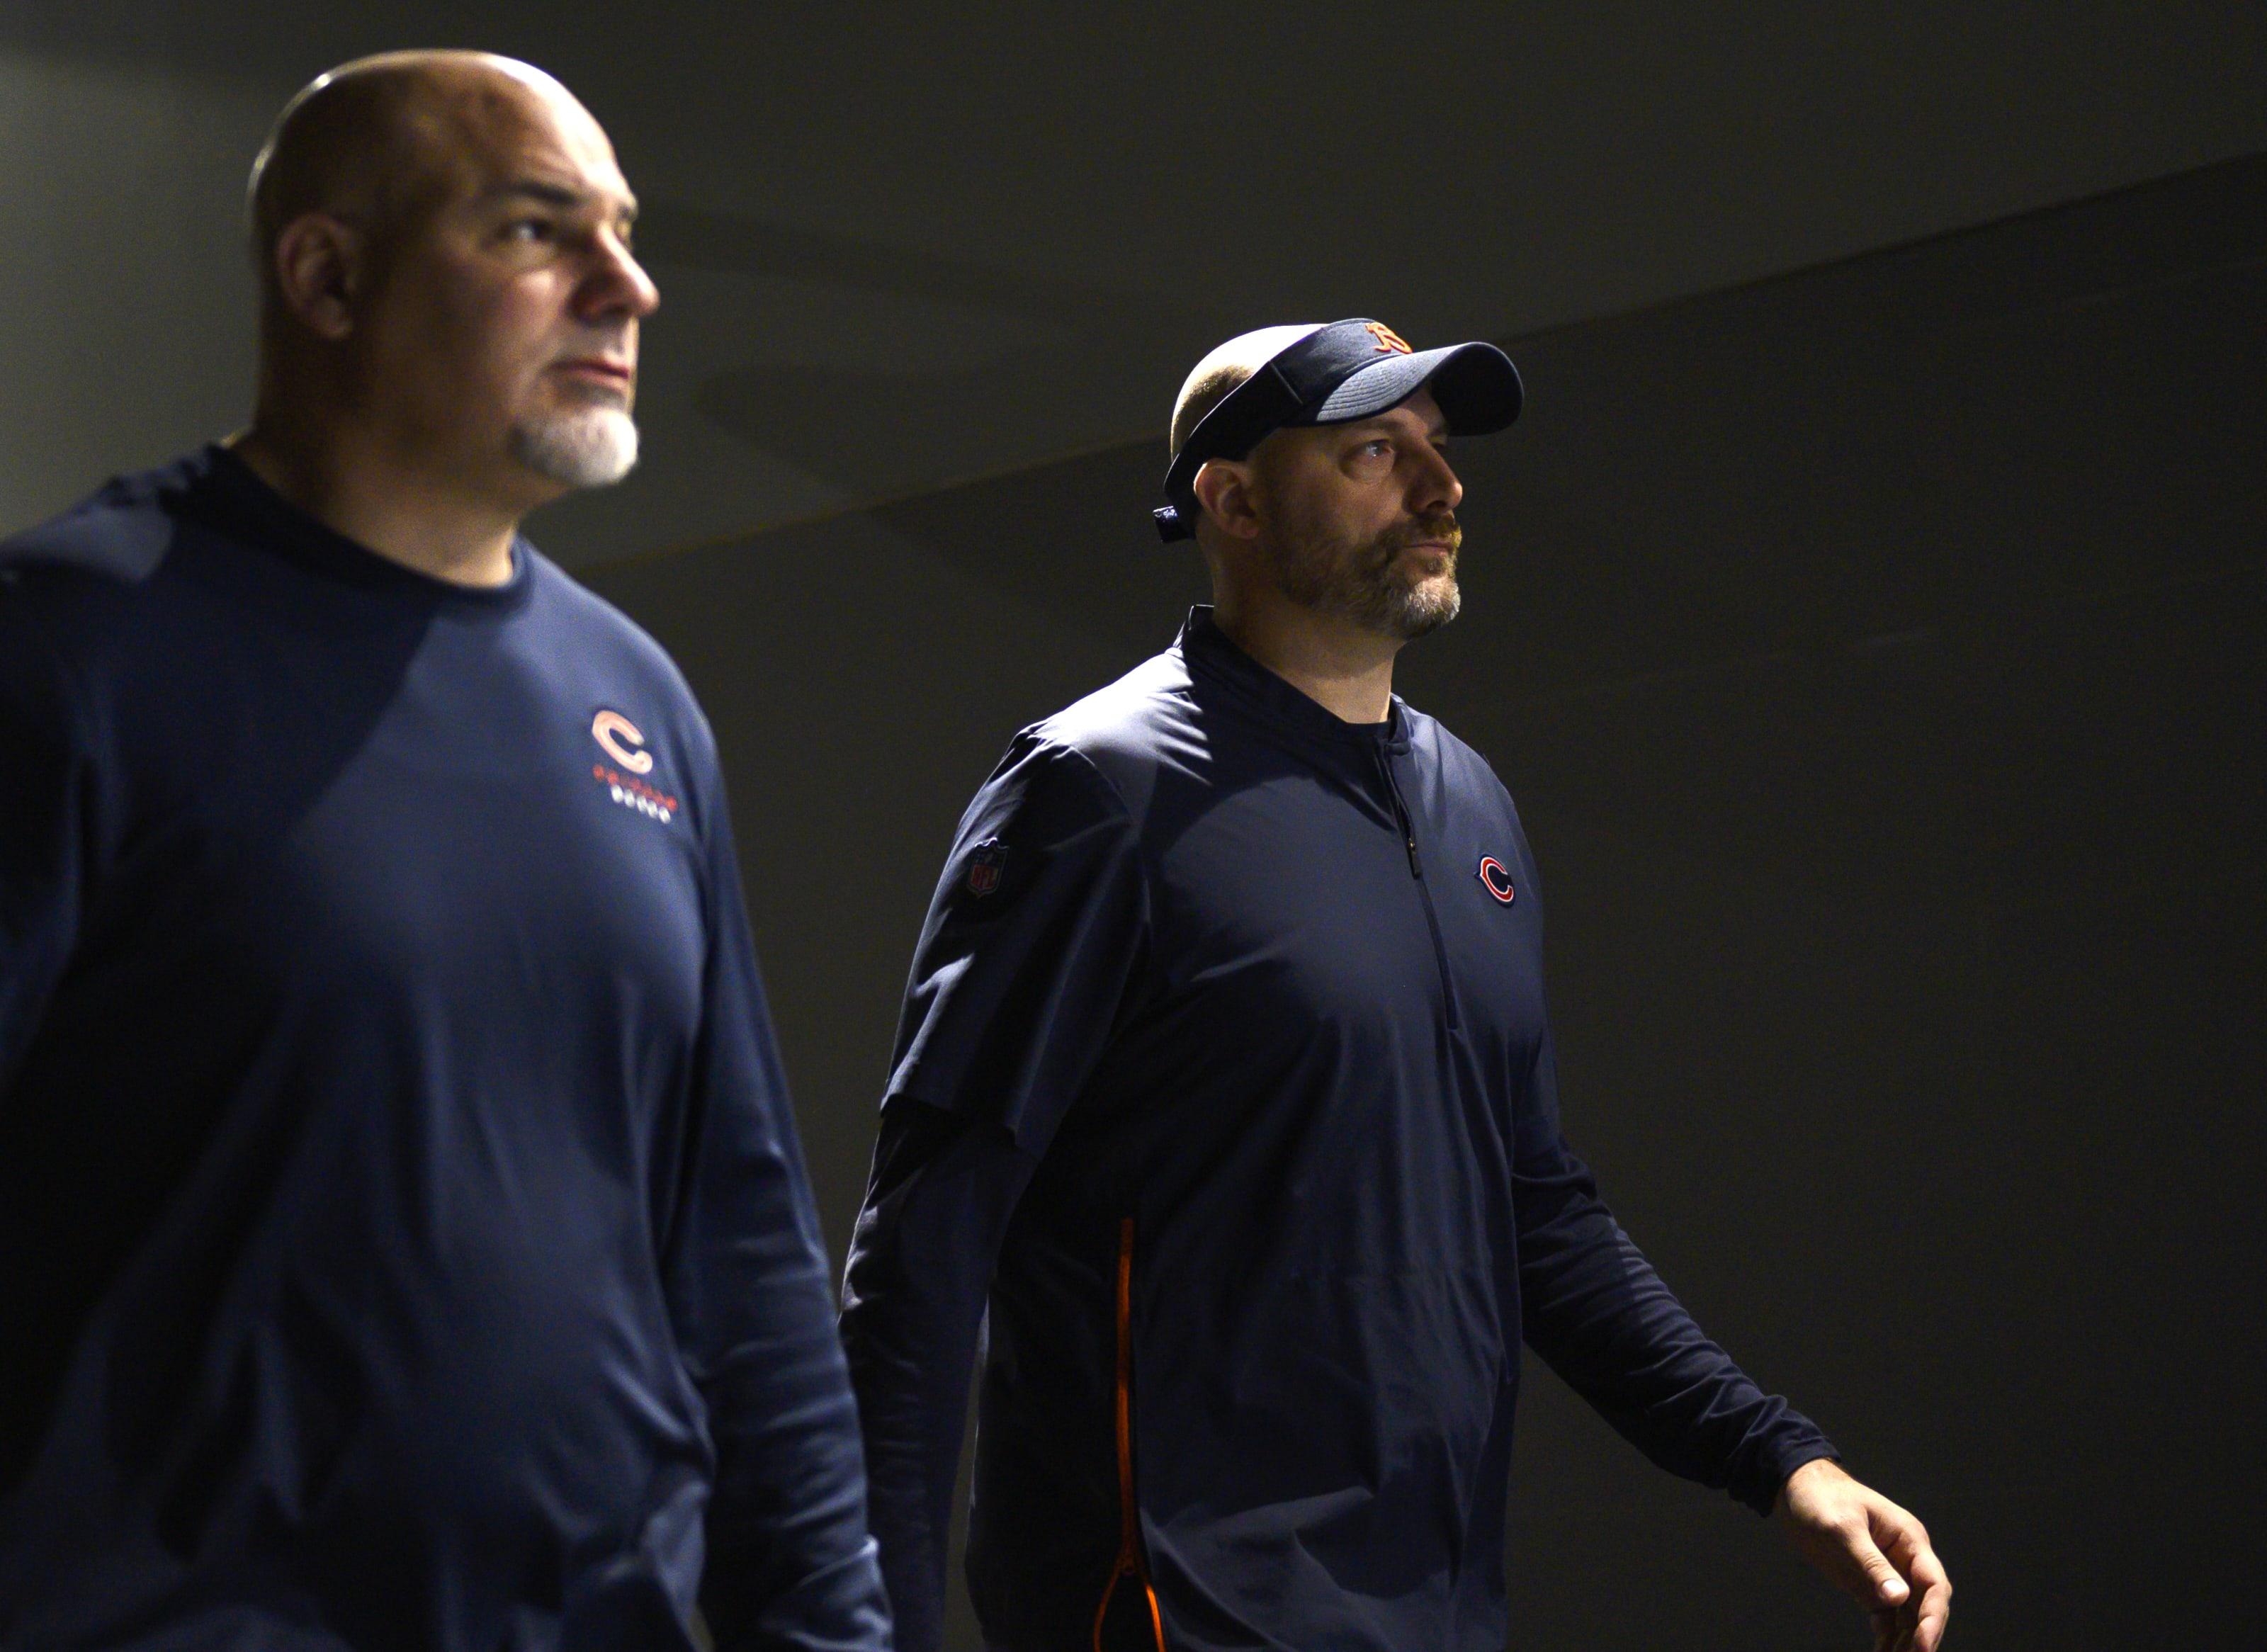 Chicago Bears head coach Matt Nagy